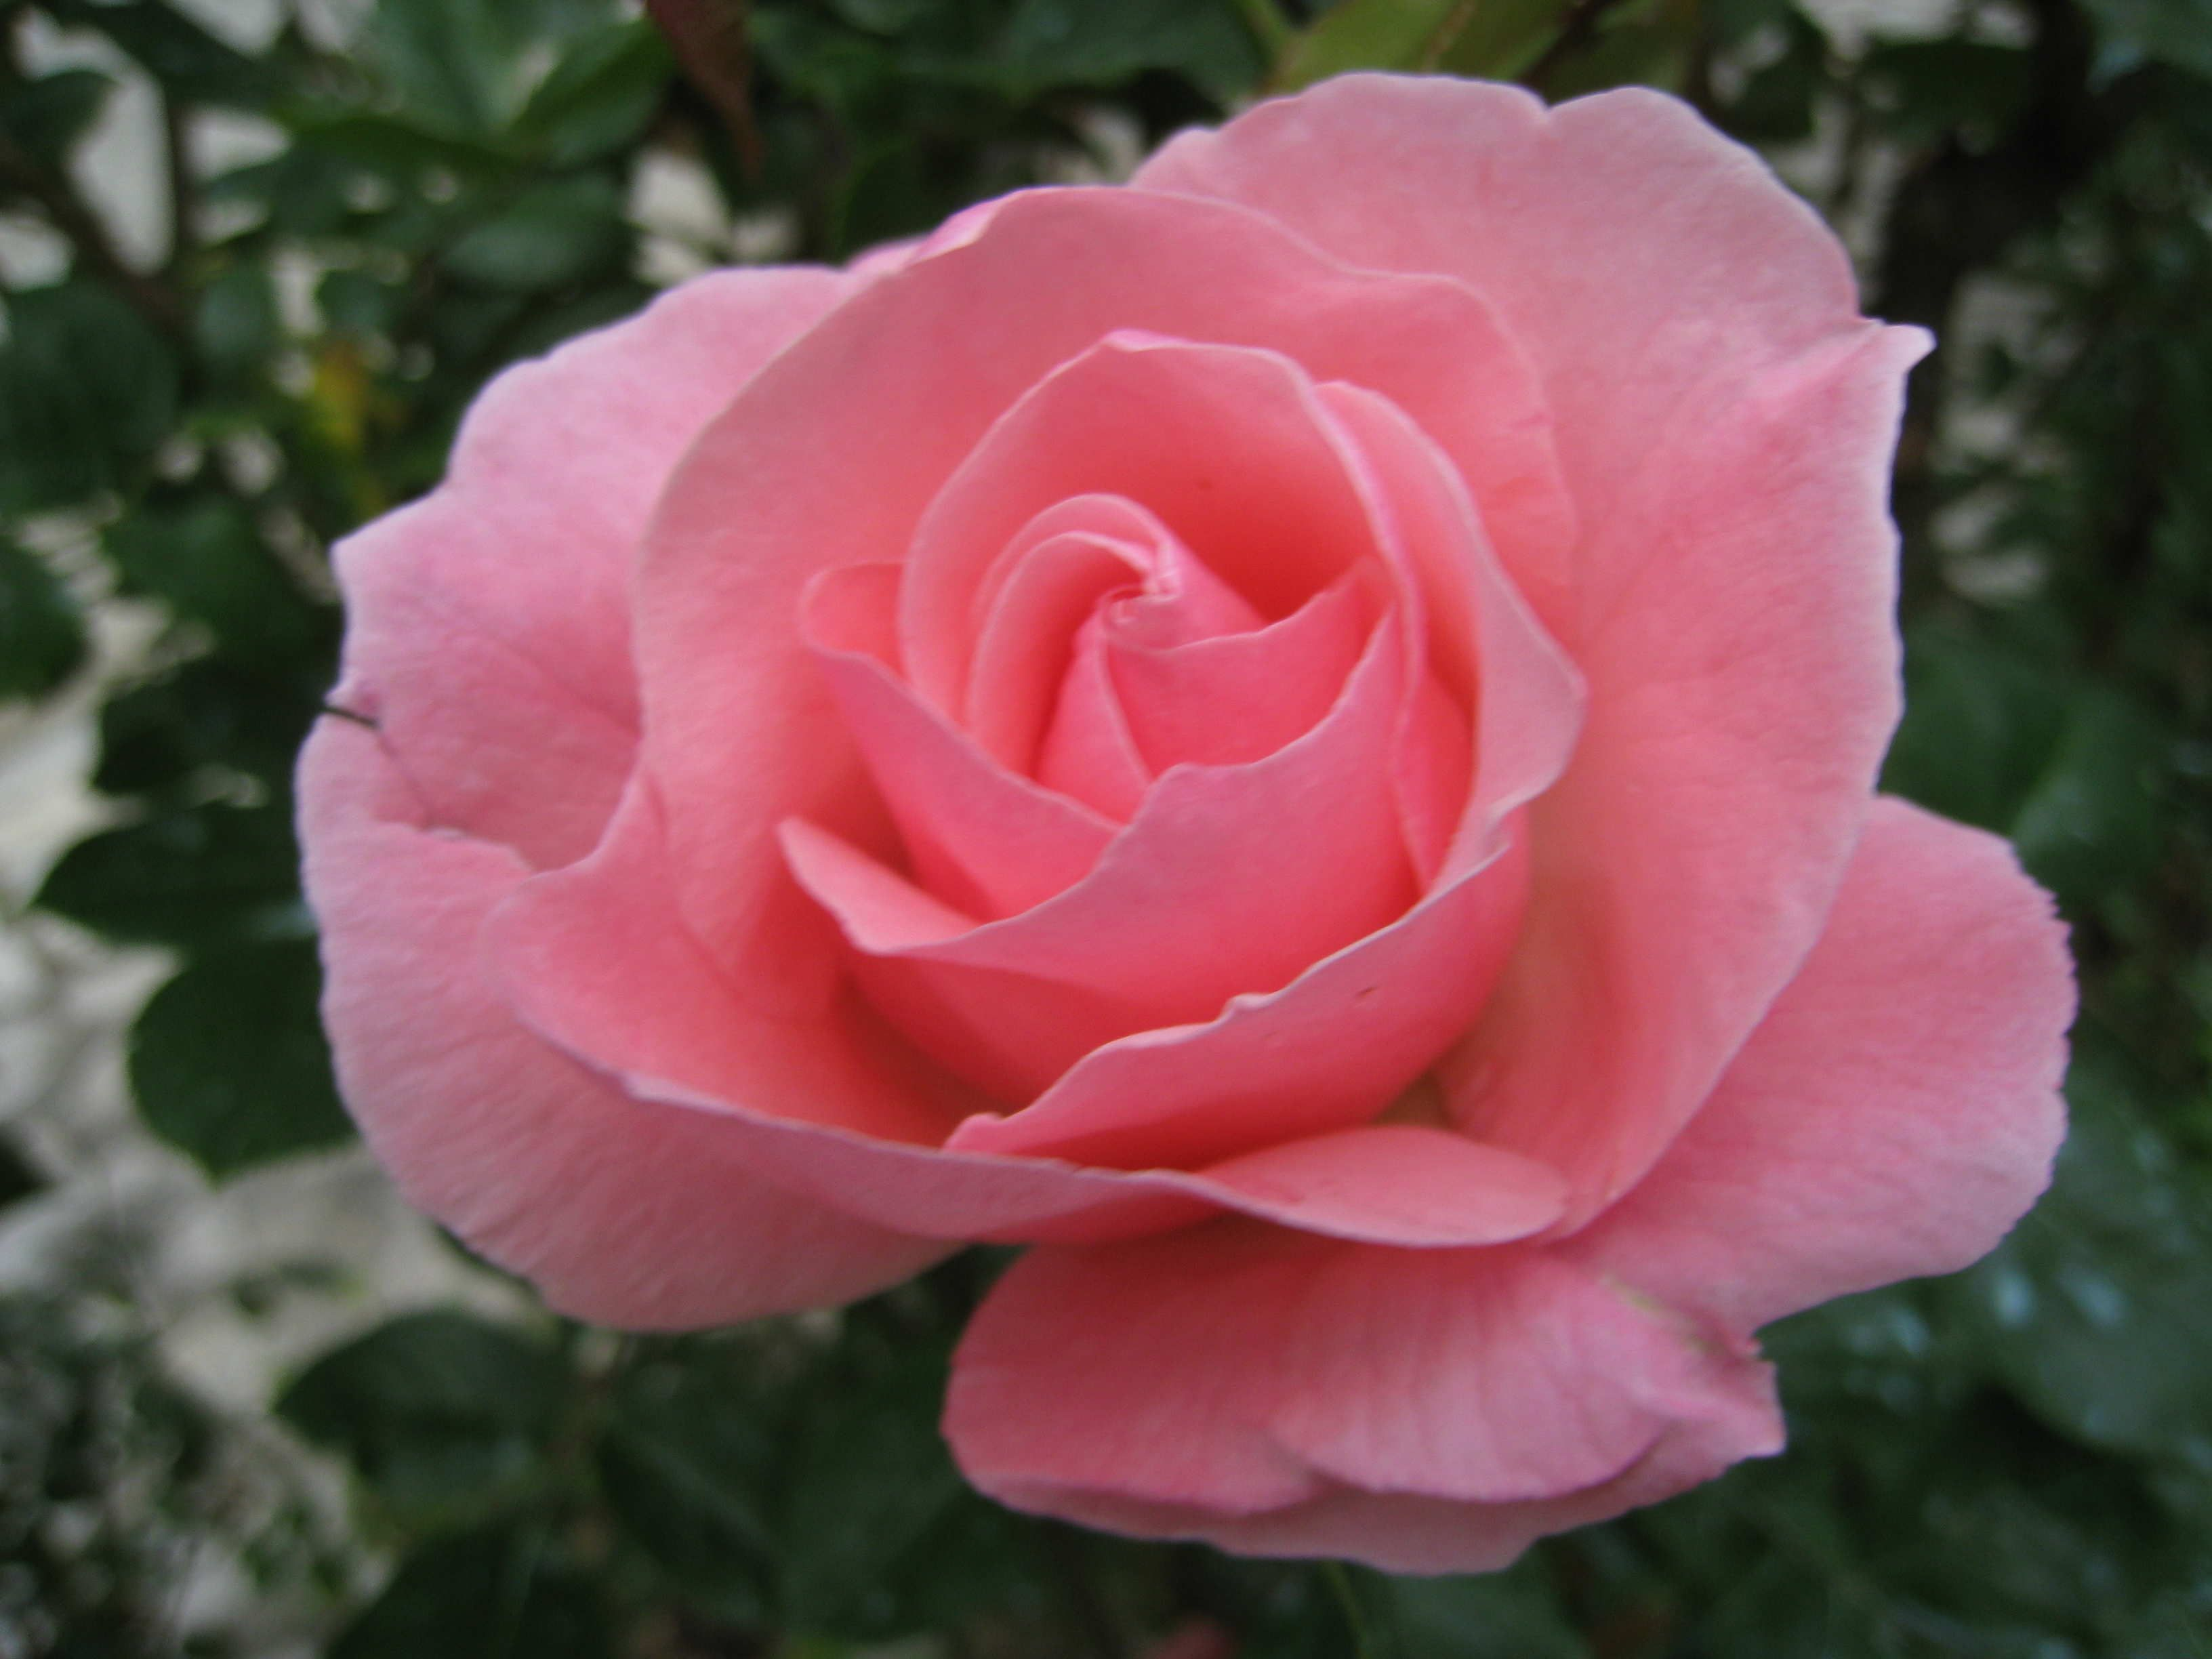 Blog de luluaccordeon : ACCORDEONISTE LUCIEN NOURTIER, UNE ROSE POUR SANDRA